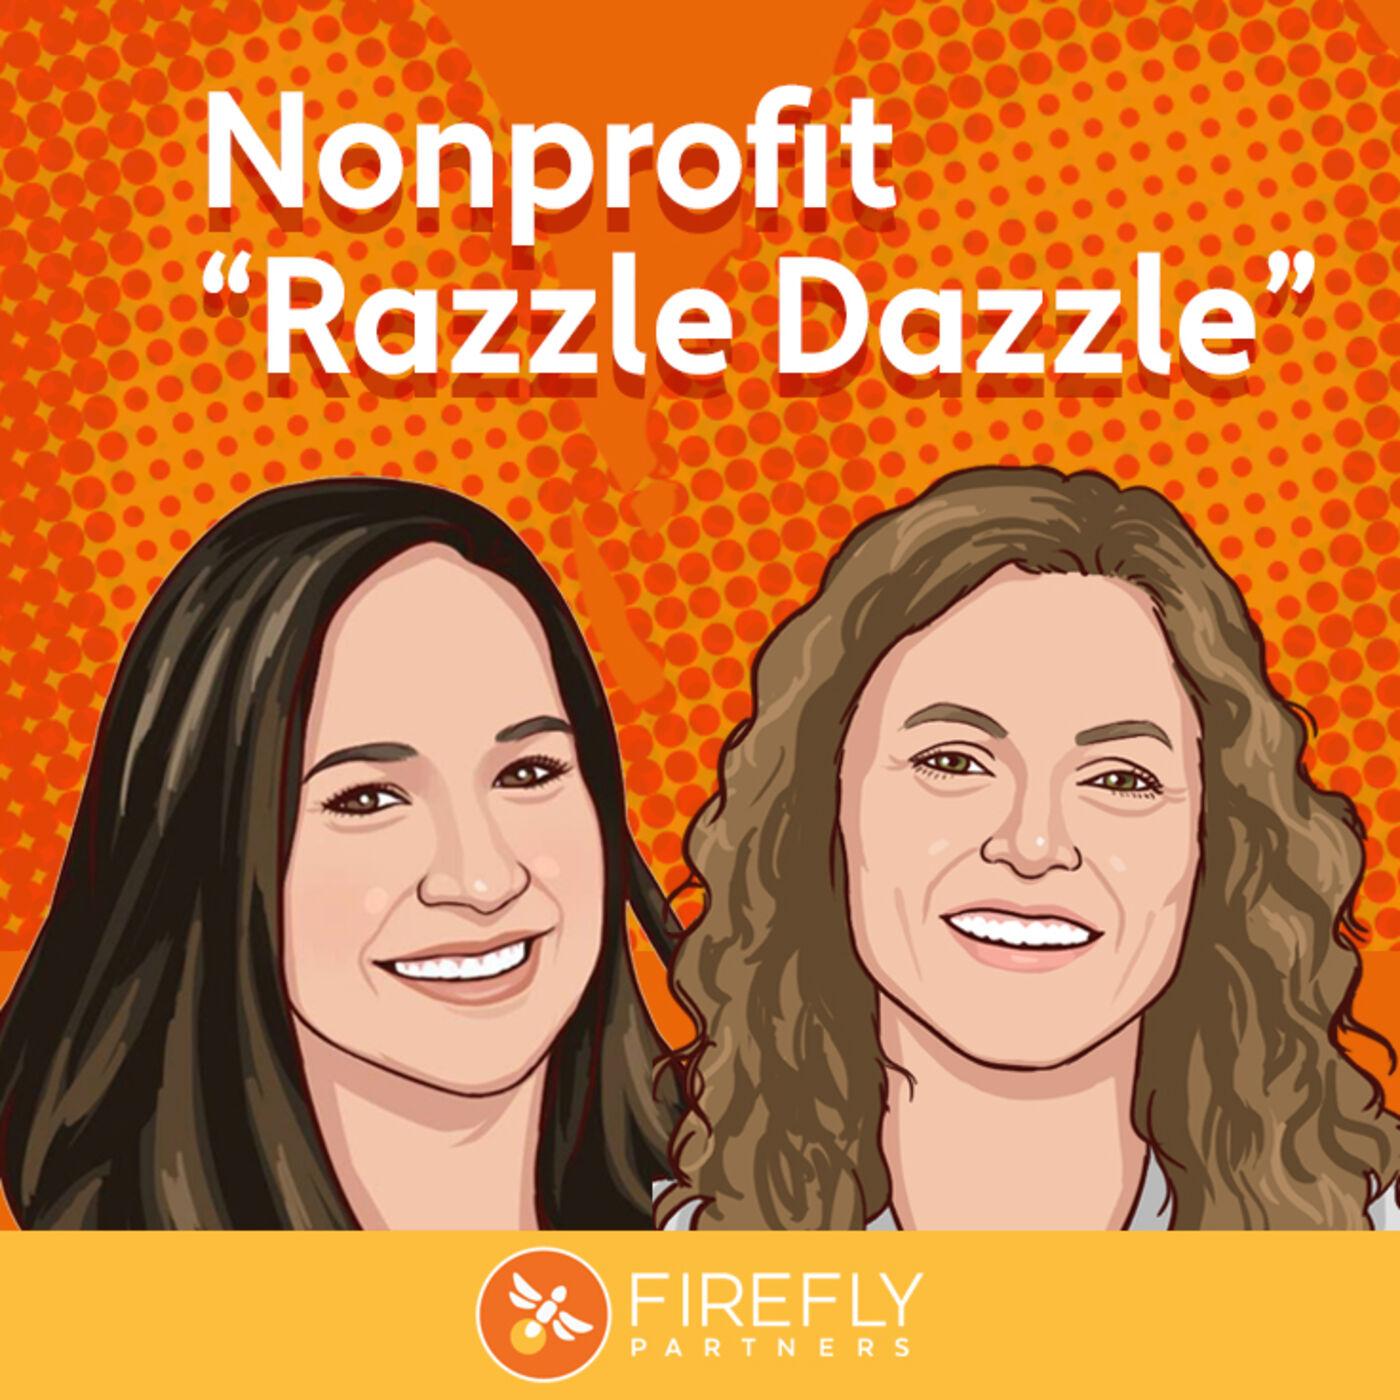 Nonprofit Razzle Dazzle